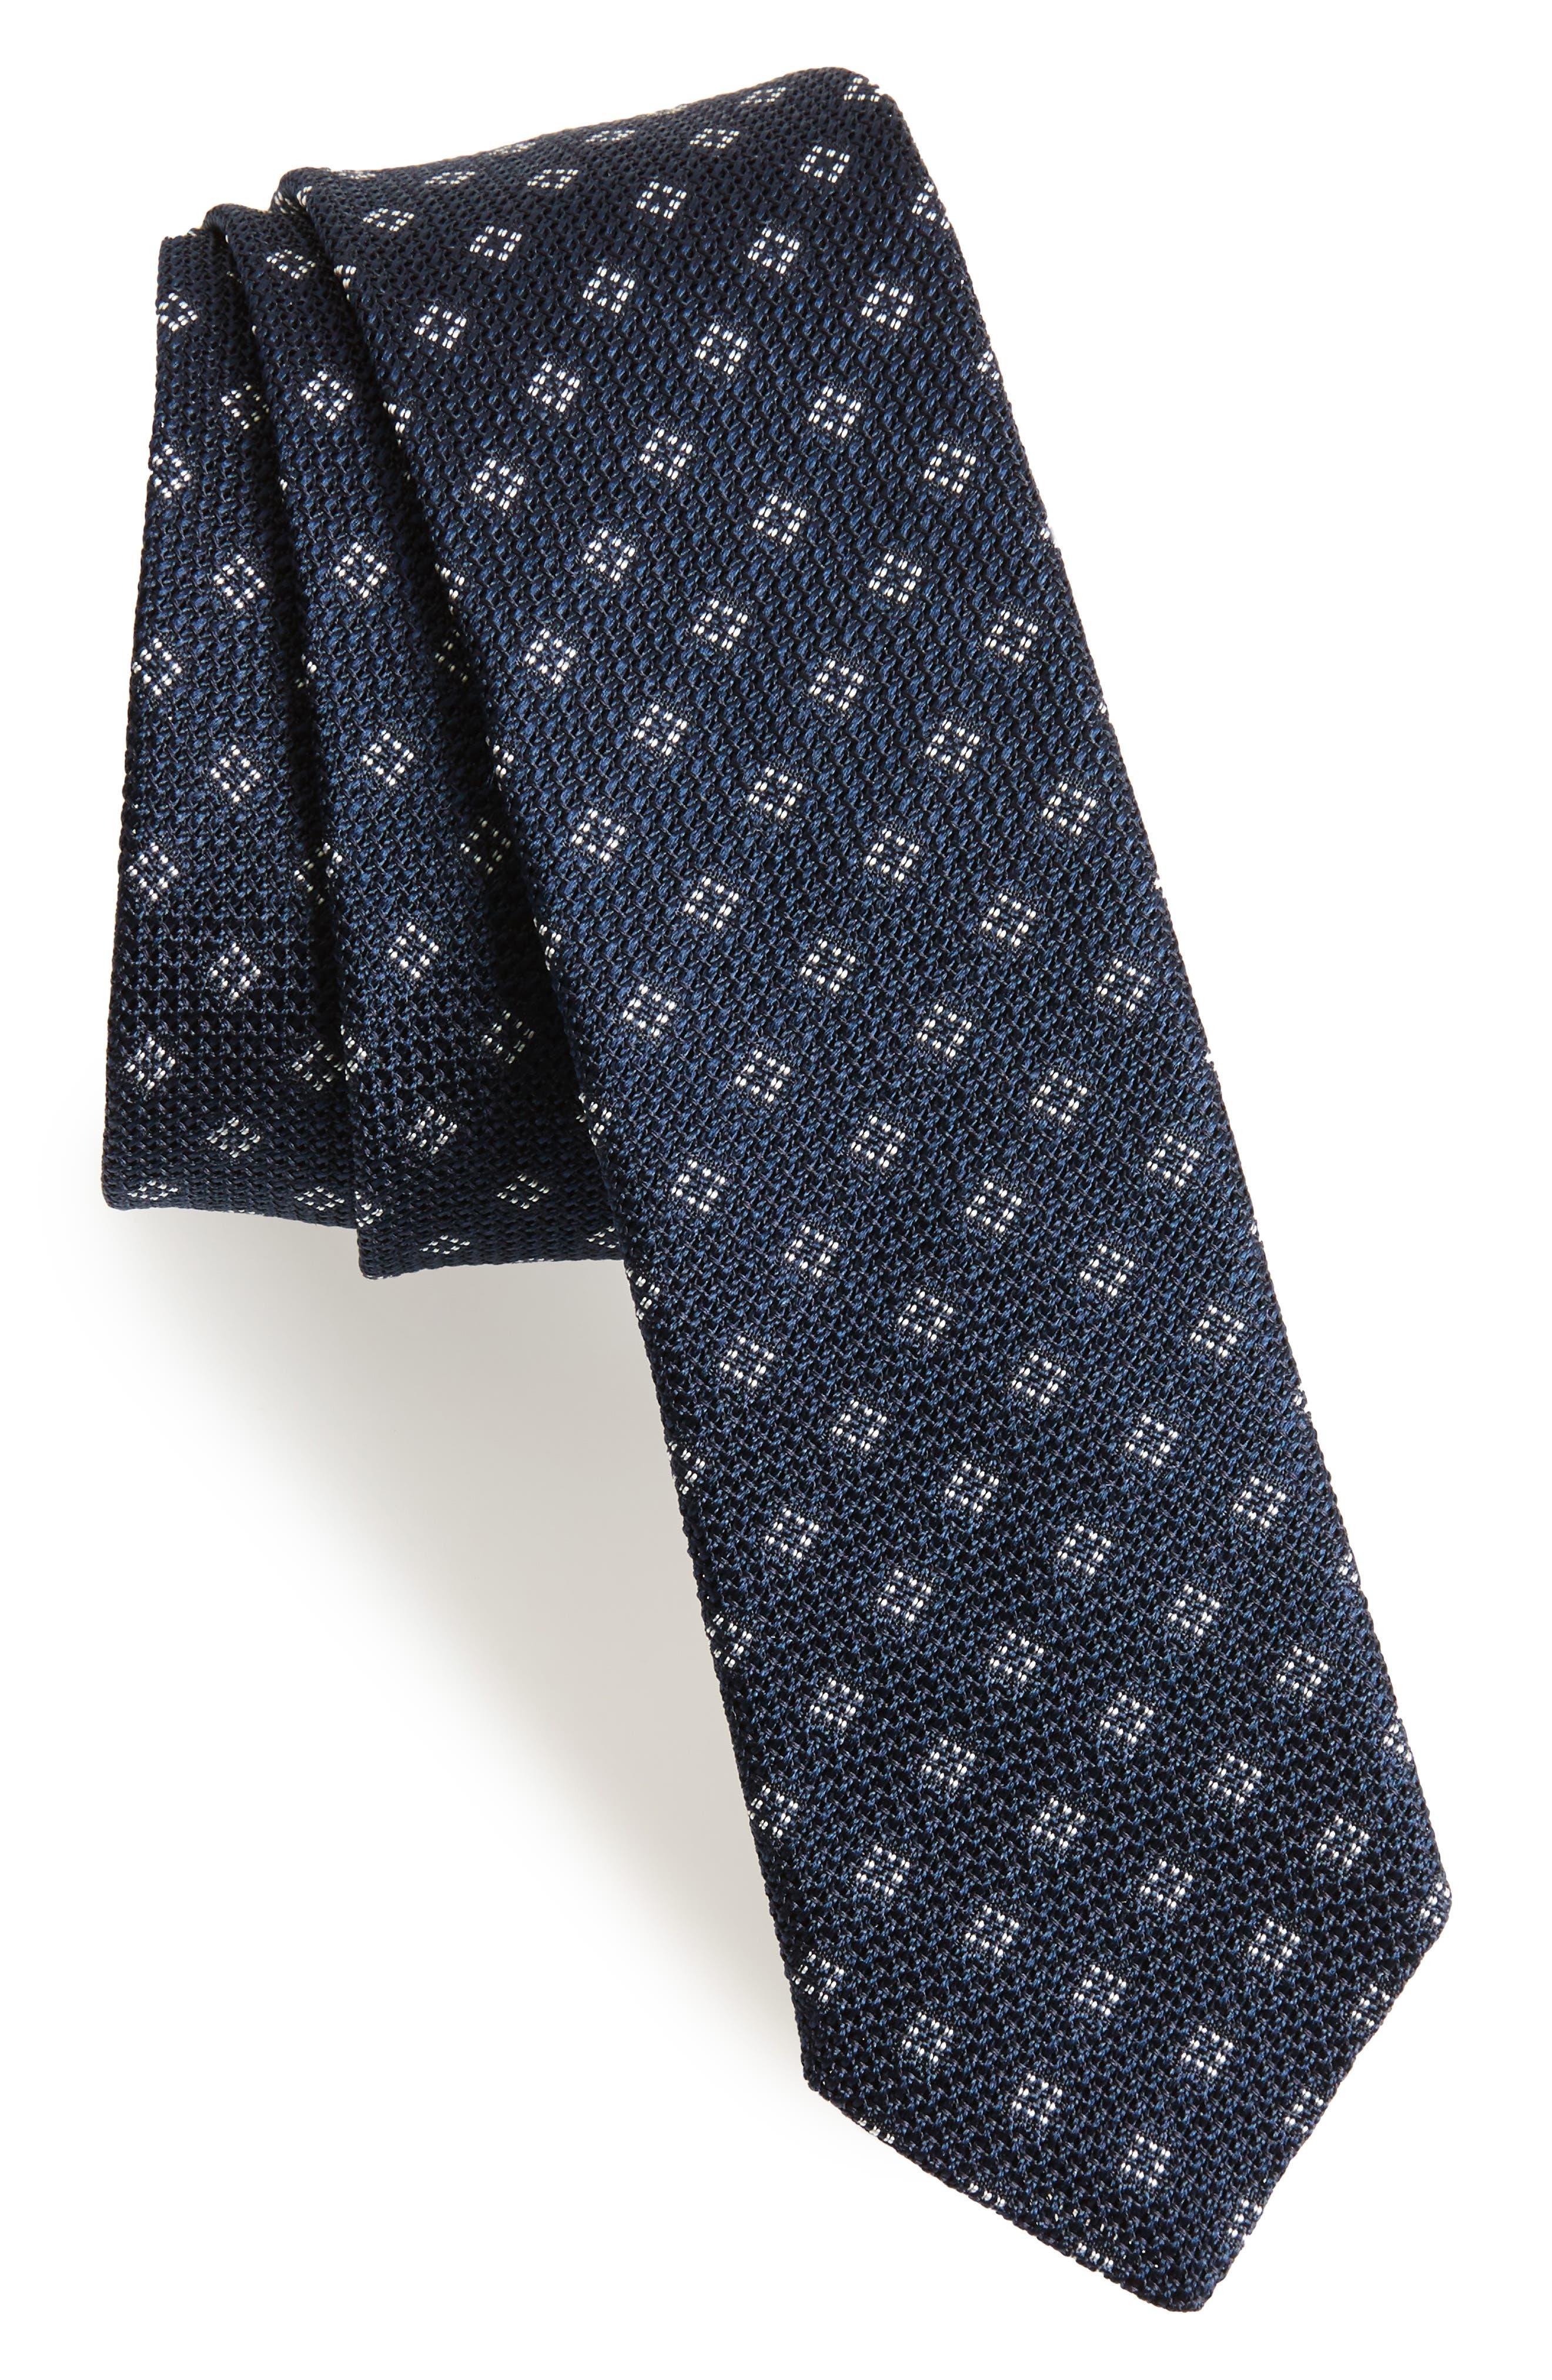 Medallion Silk Skinny Tie,                         Main,                         color, 411